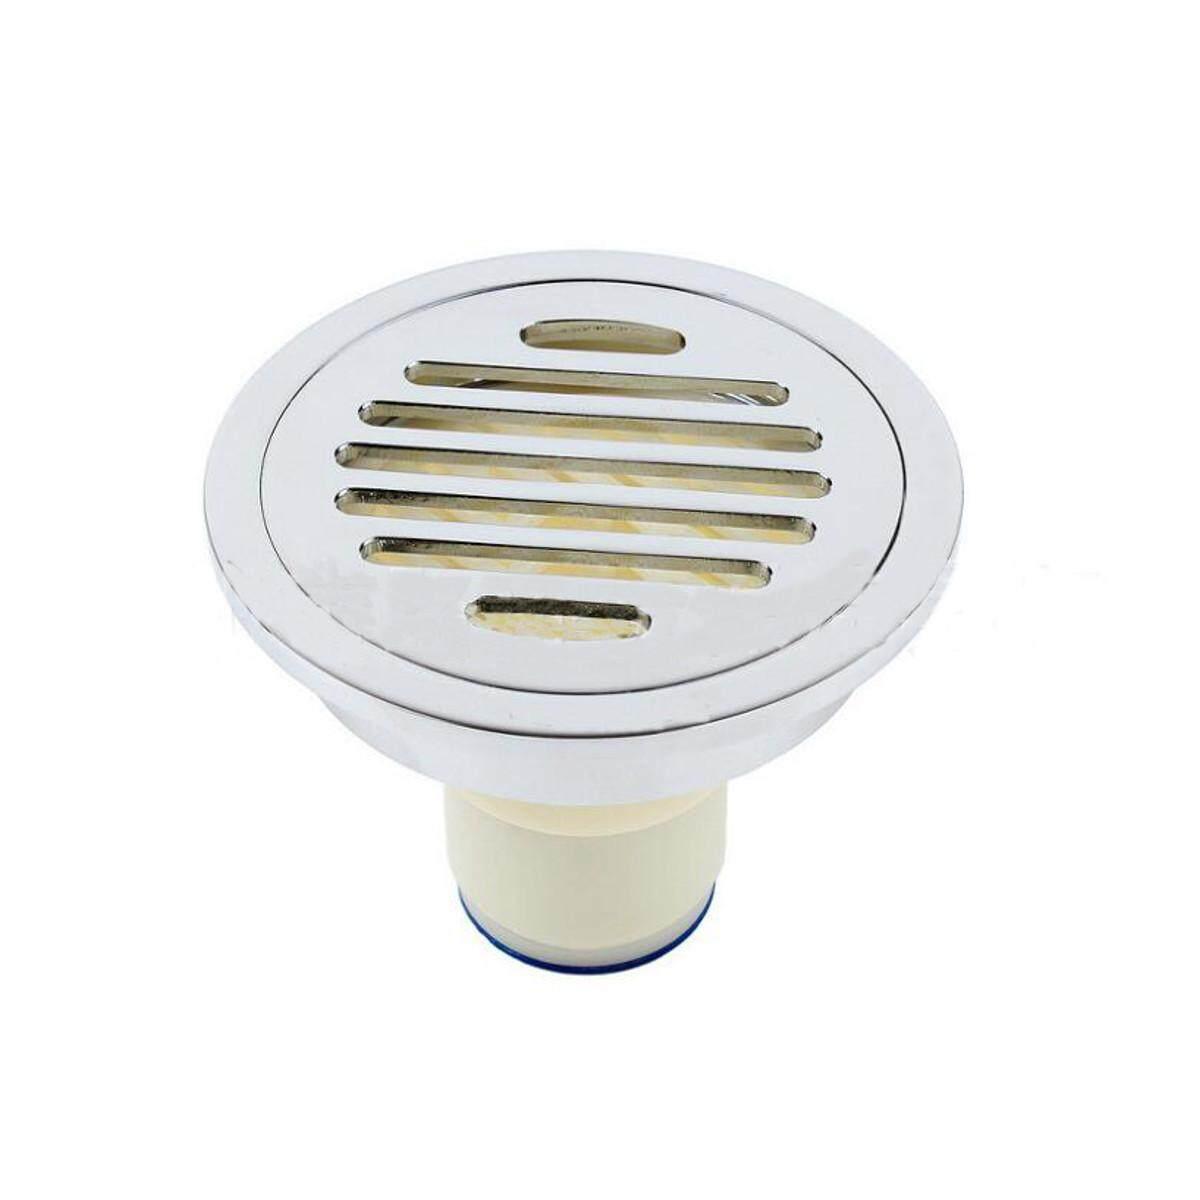 Floor Drain Round Bathroom Kitchen Wet room Shower Drain Grate Brass Plumbing# single-purpose